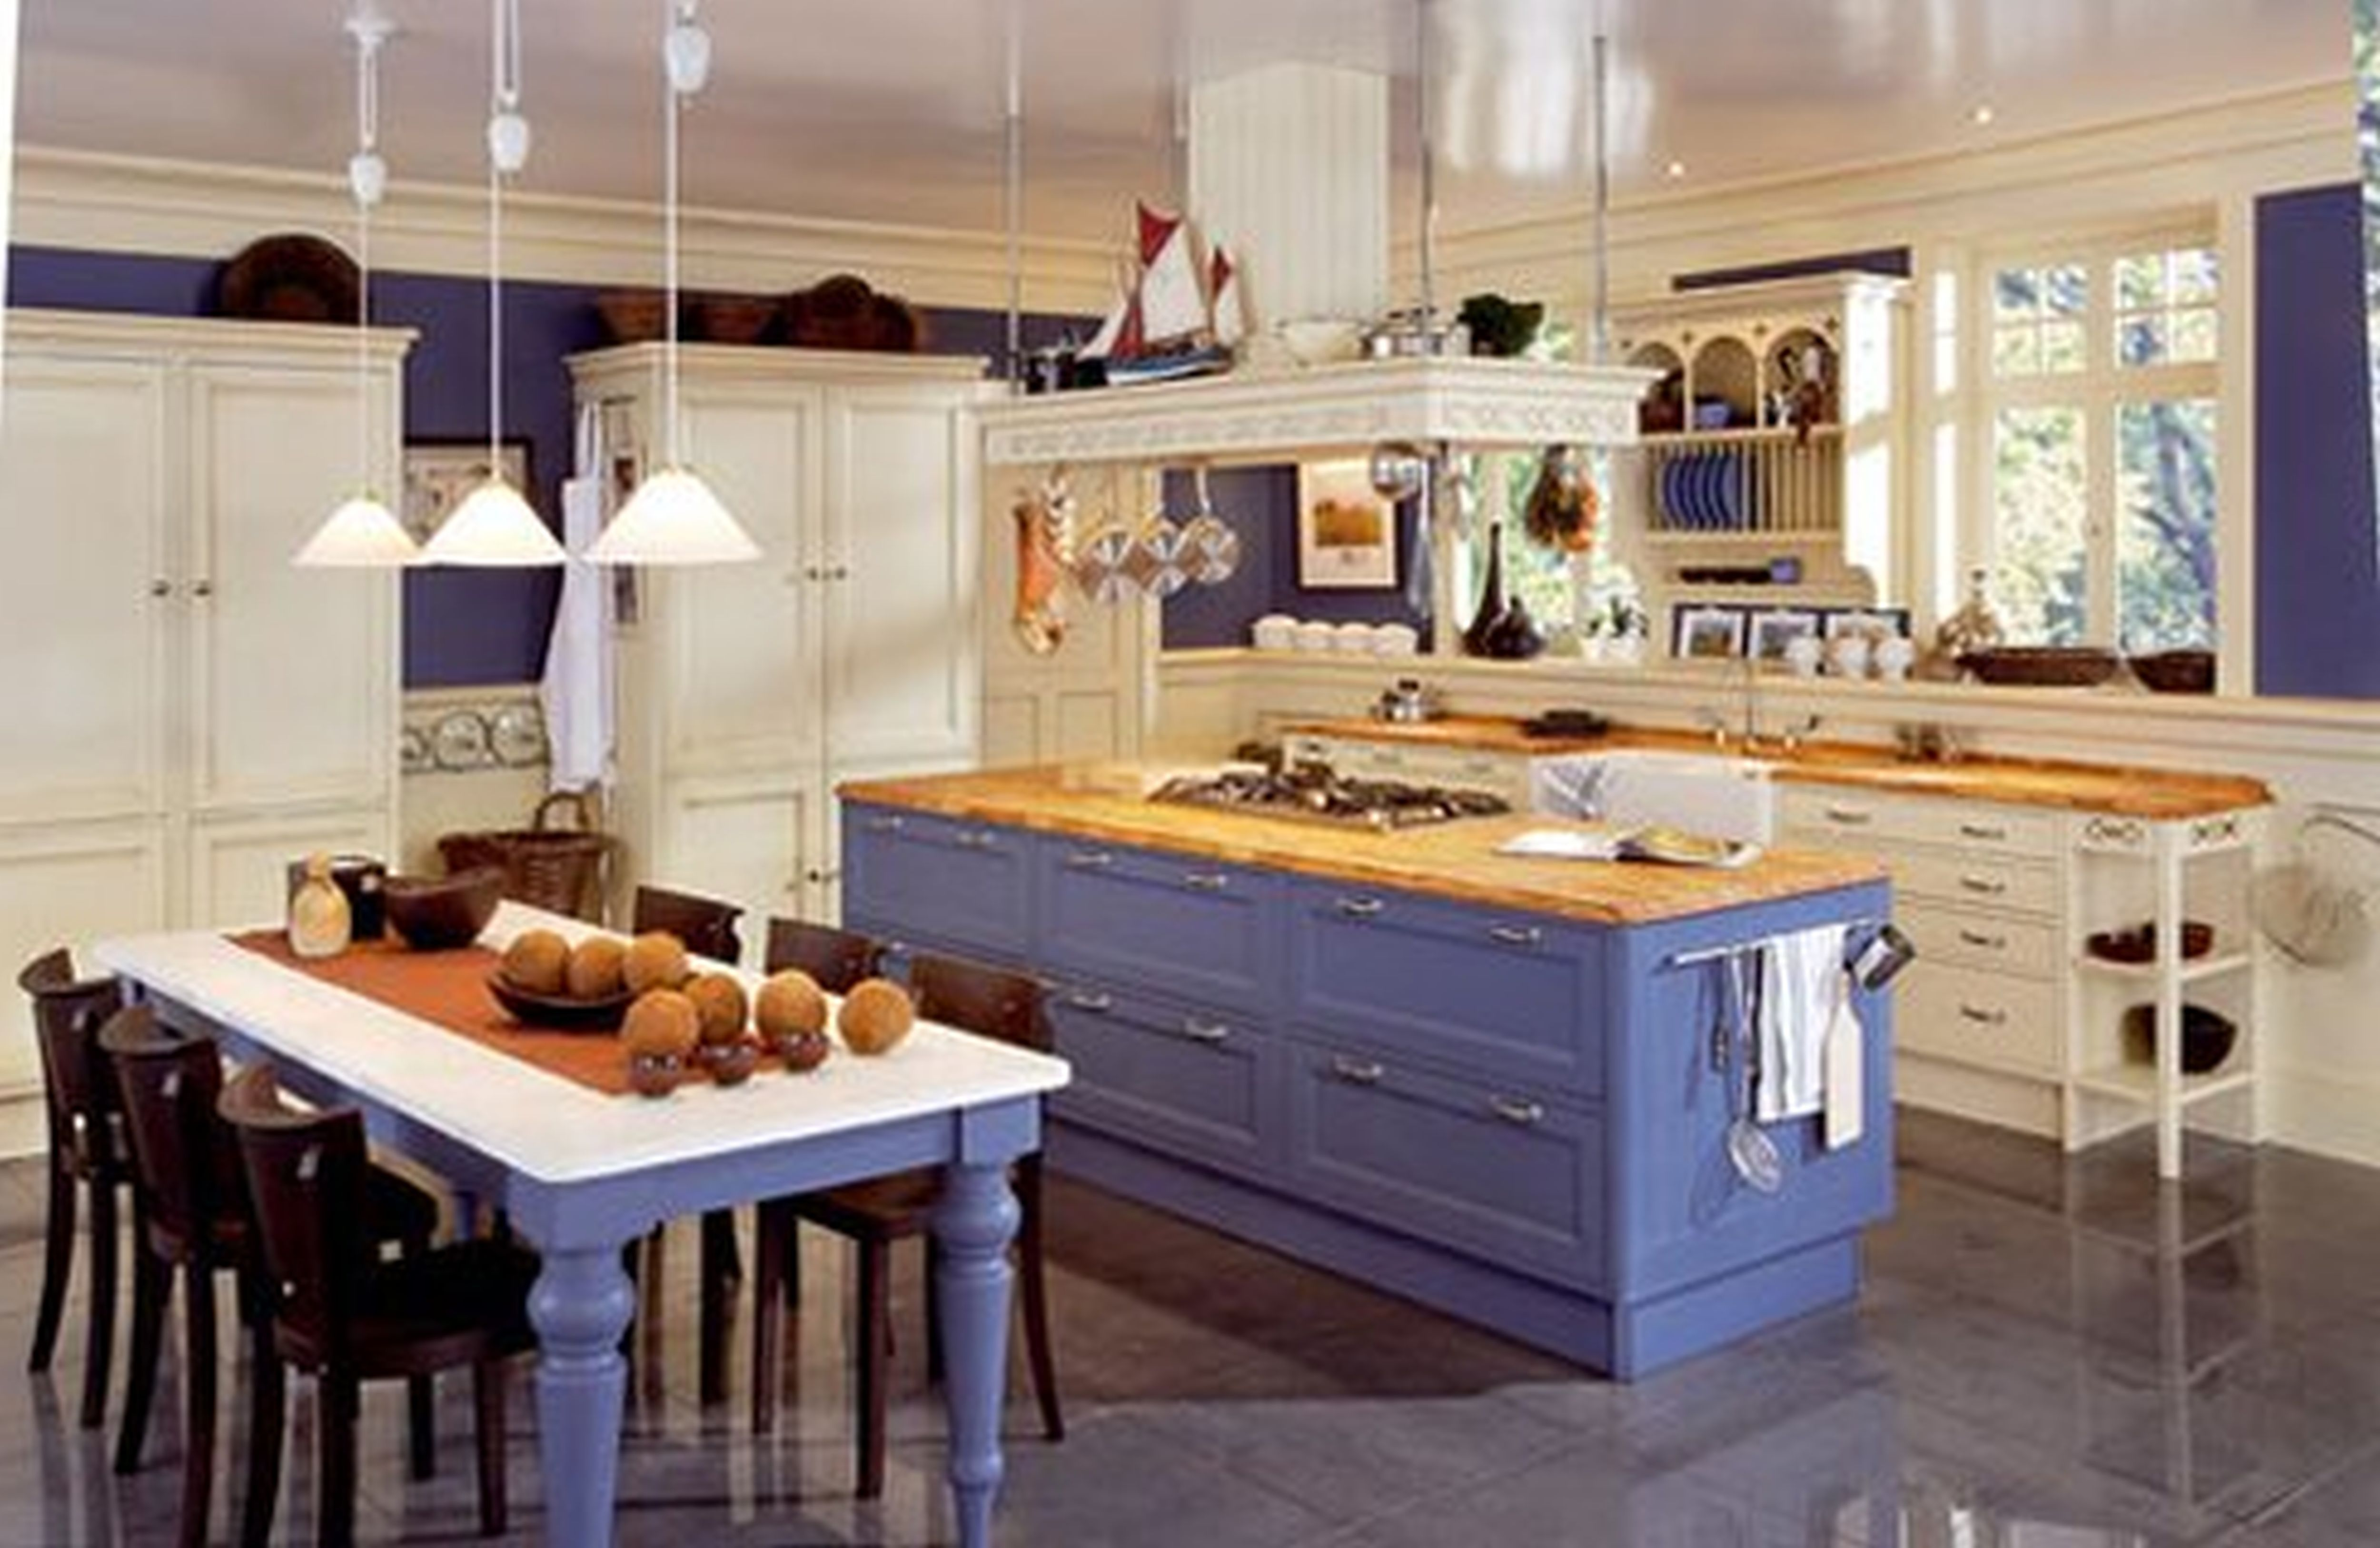 25 Incredible Good Kitchen Design Ideas  Kitchen Design Fascinating Good Kitchen Designs Decorating Inspiration